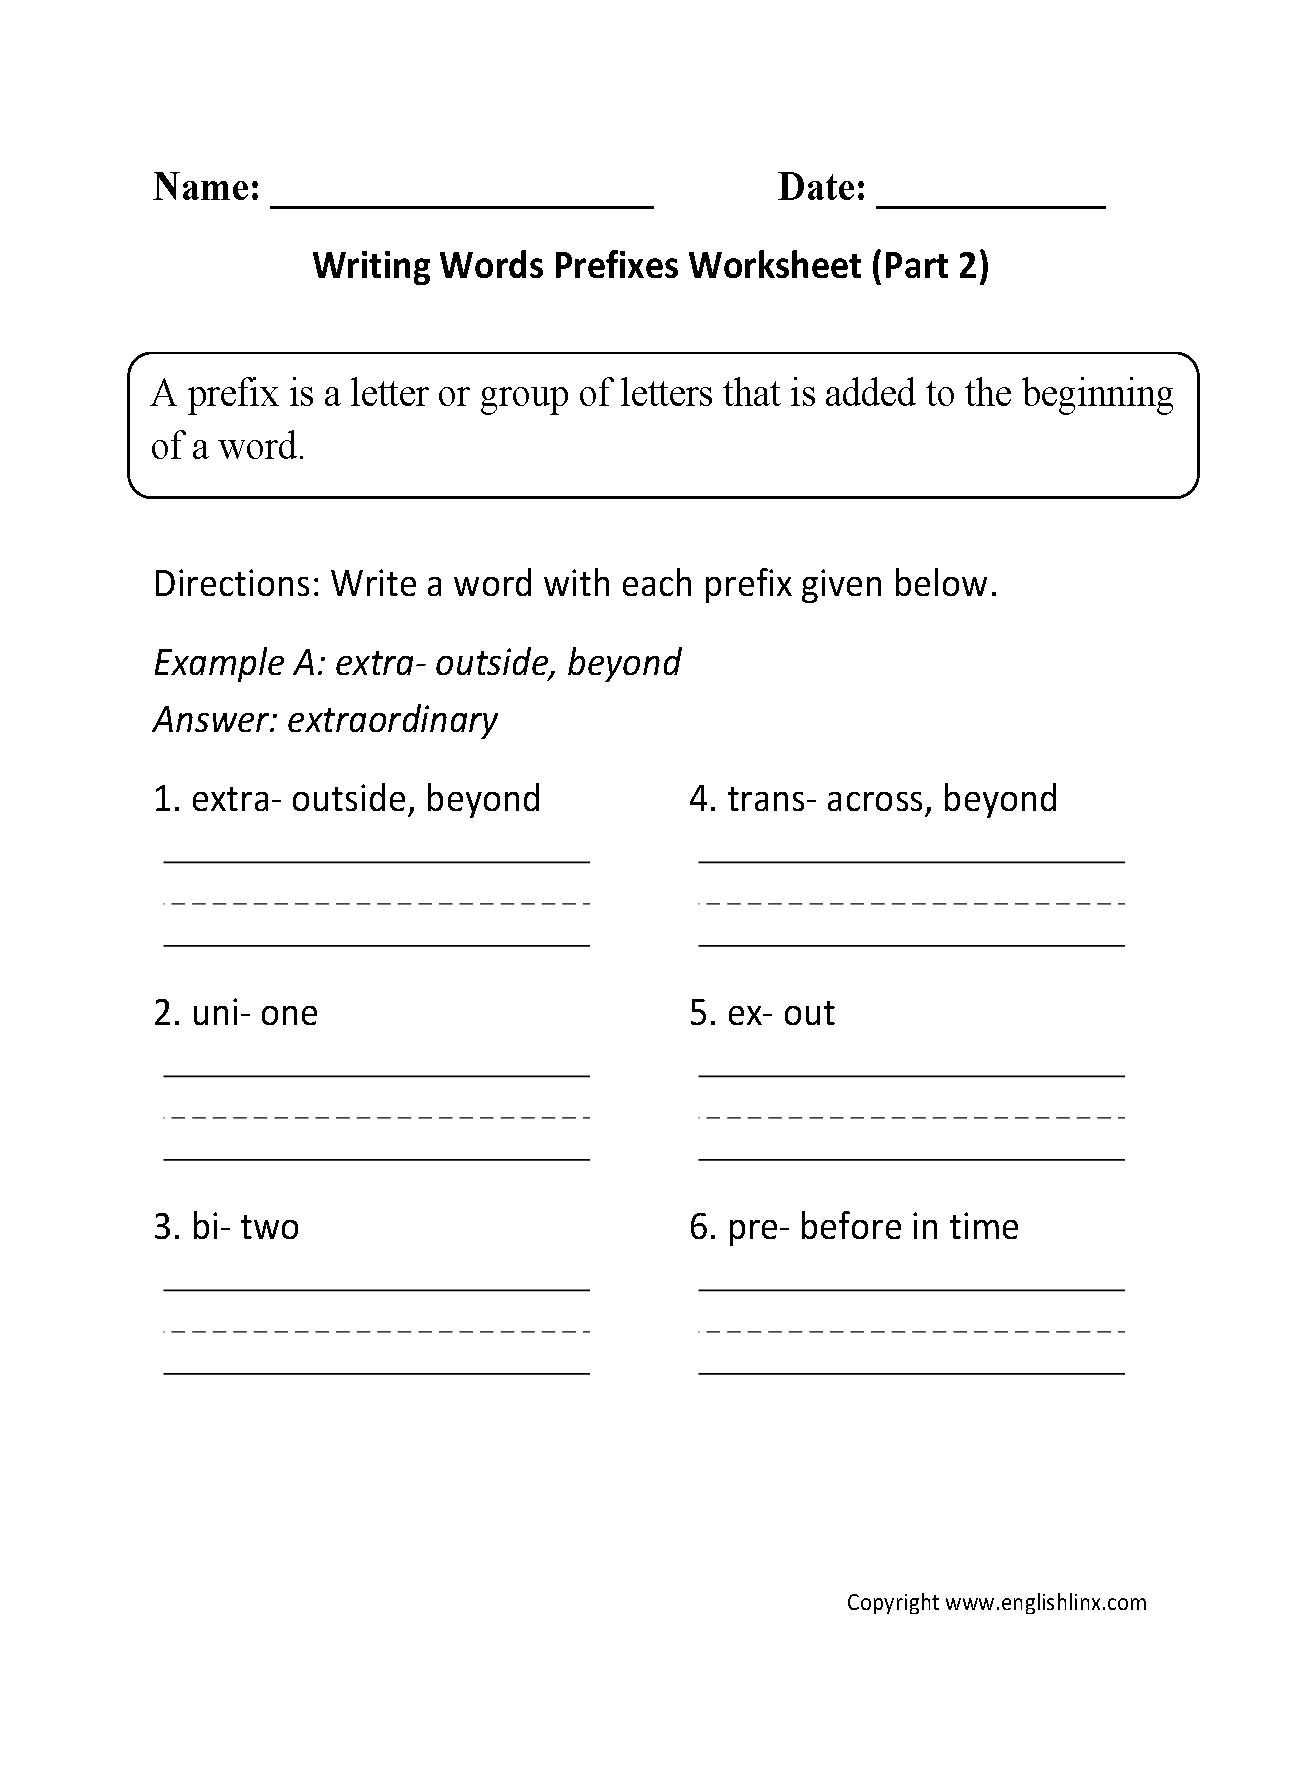 Prefixes Worksheets Middle School The Best Worksheets Image